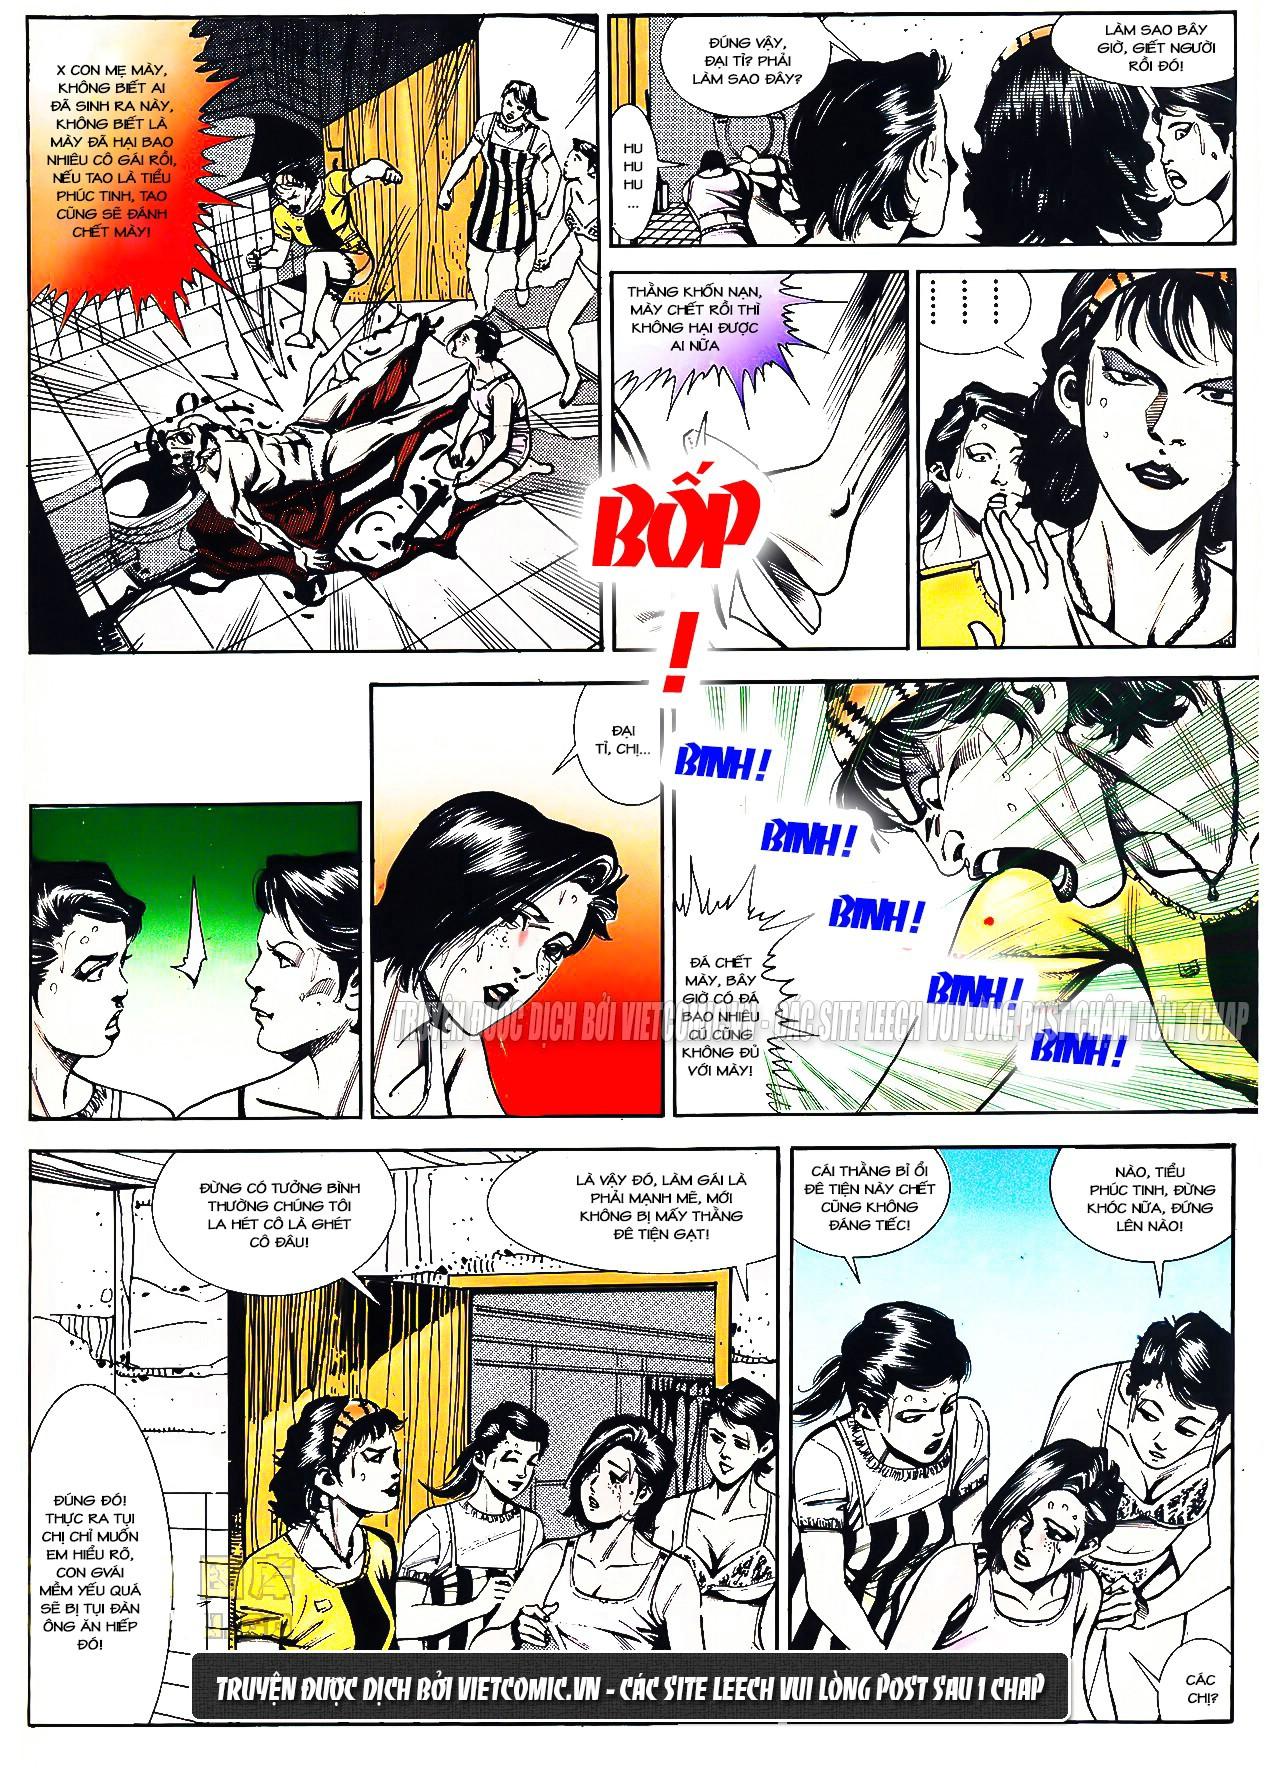 Cổ Hoặc Nữ Chap 16 - Next Chap 17